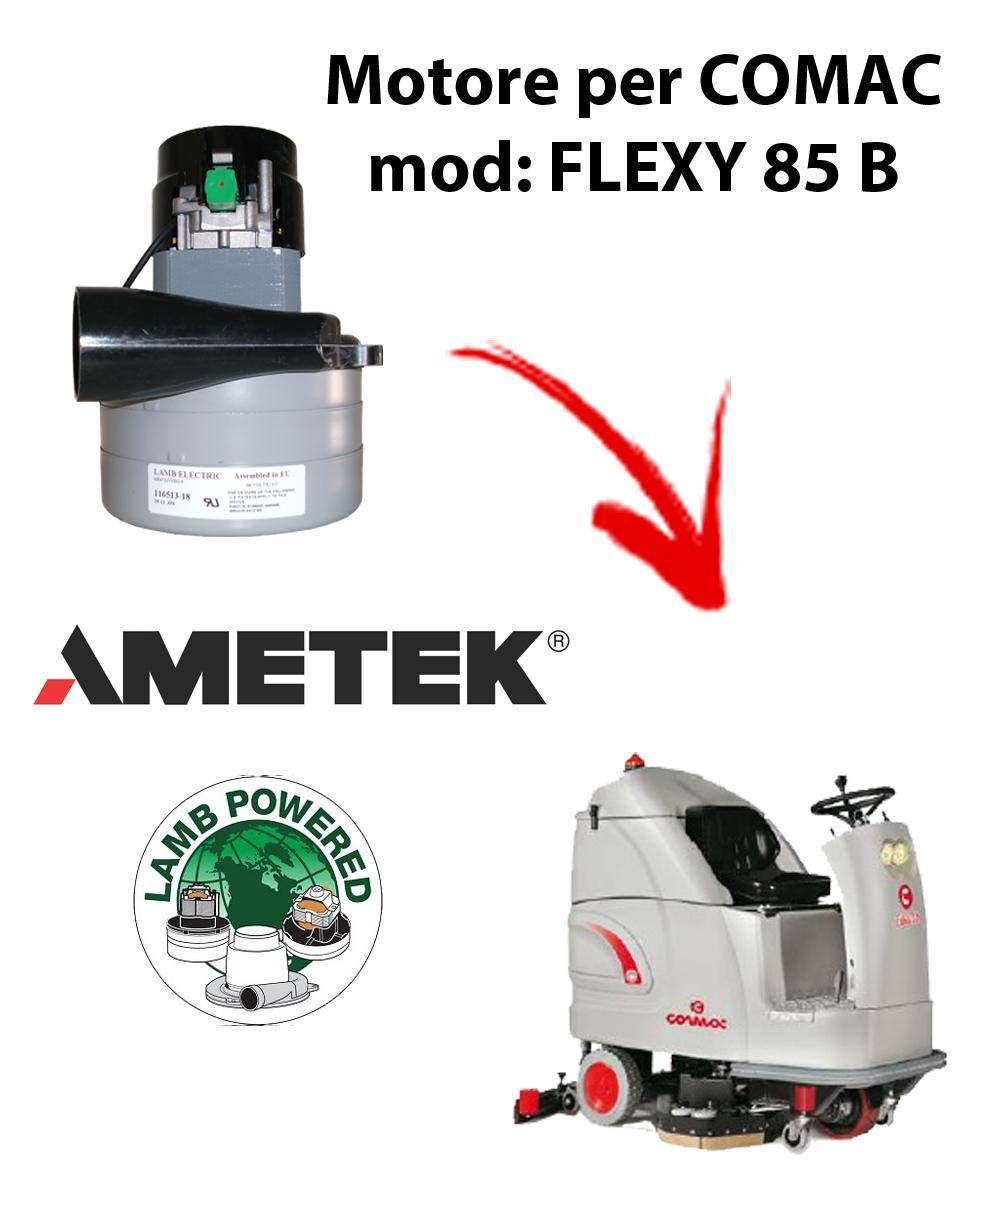 FLEXY 85 B Saugmotor AMETEK für scheuersaugmaschinen COMAC